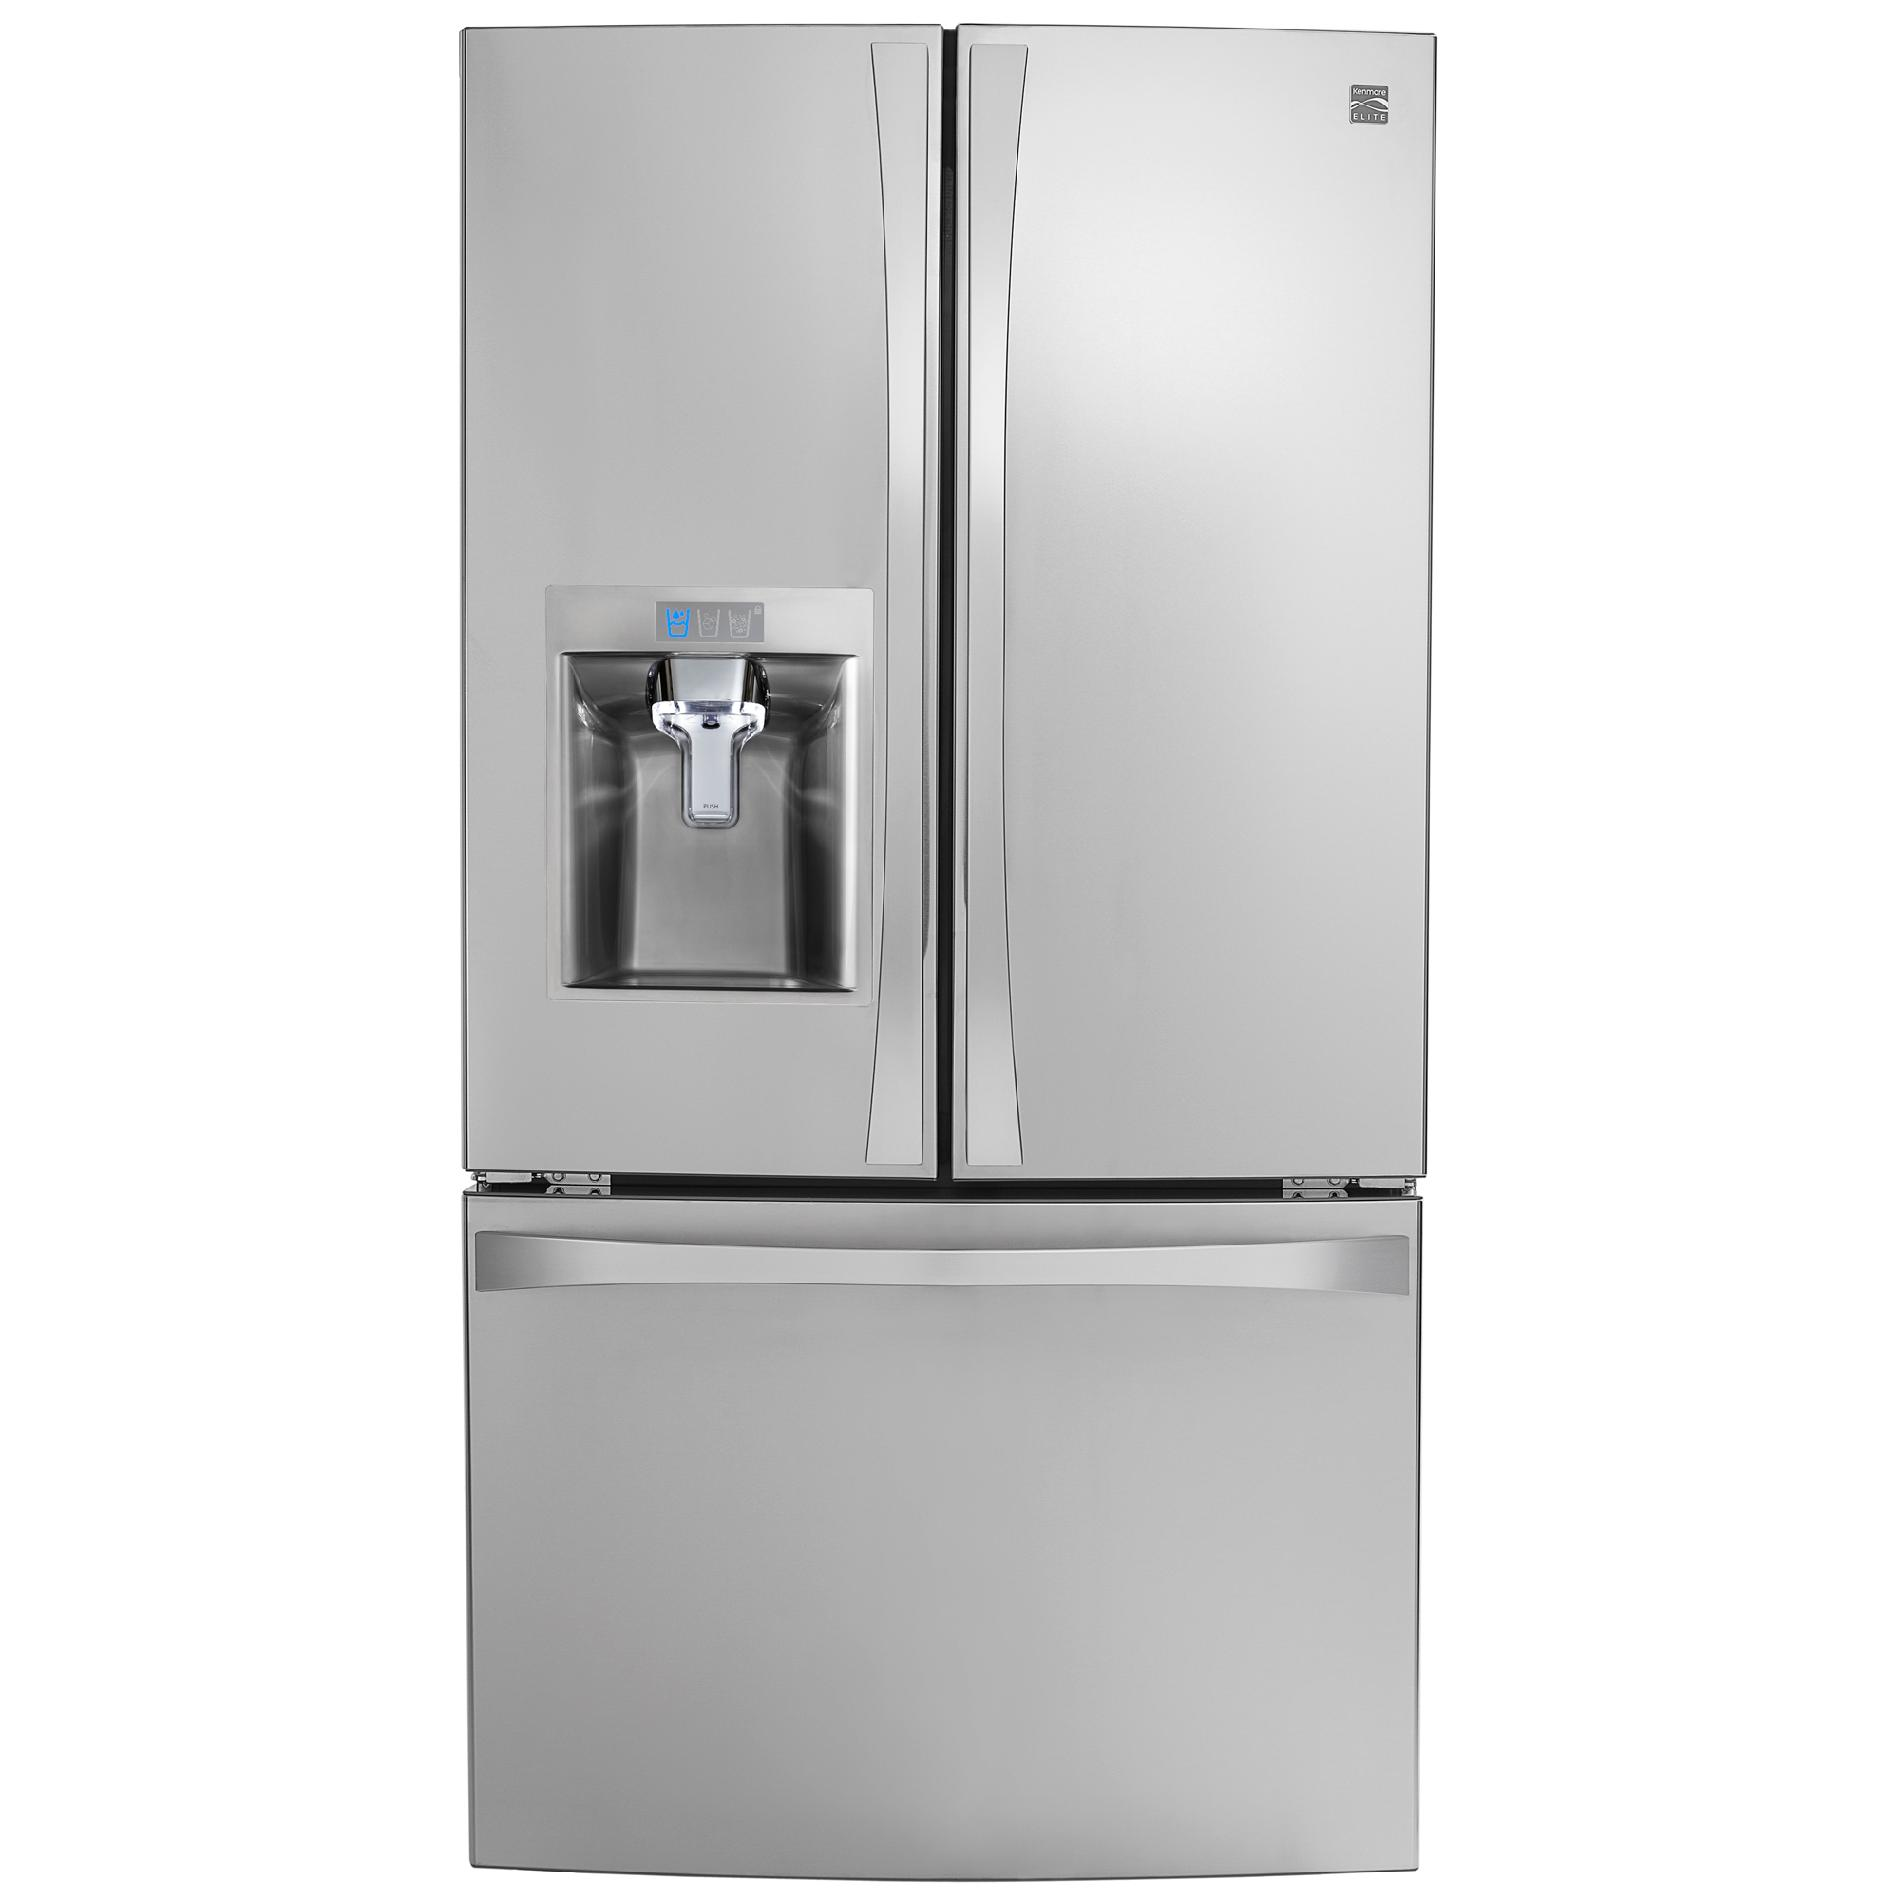 hight resolution of kenmore elite refrigerator compressor wiring diagrams kenmore freezer schematic kenmore refrigerator wiring diagram